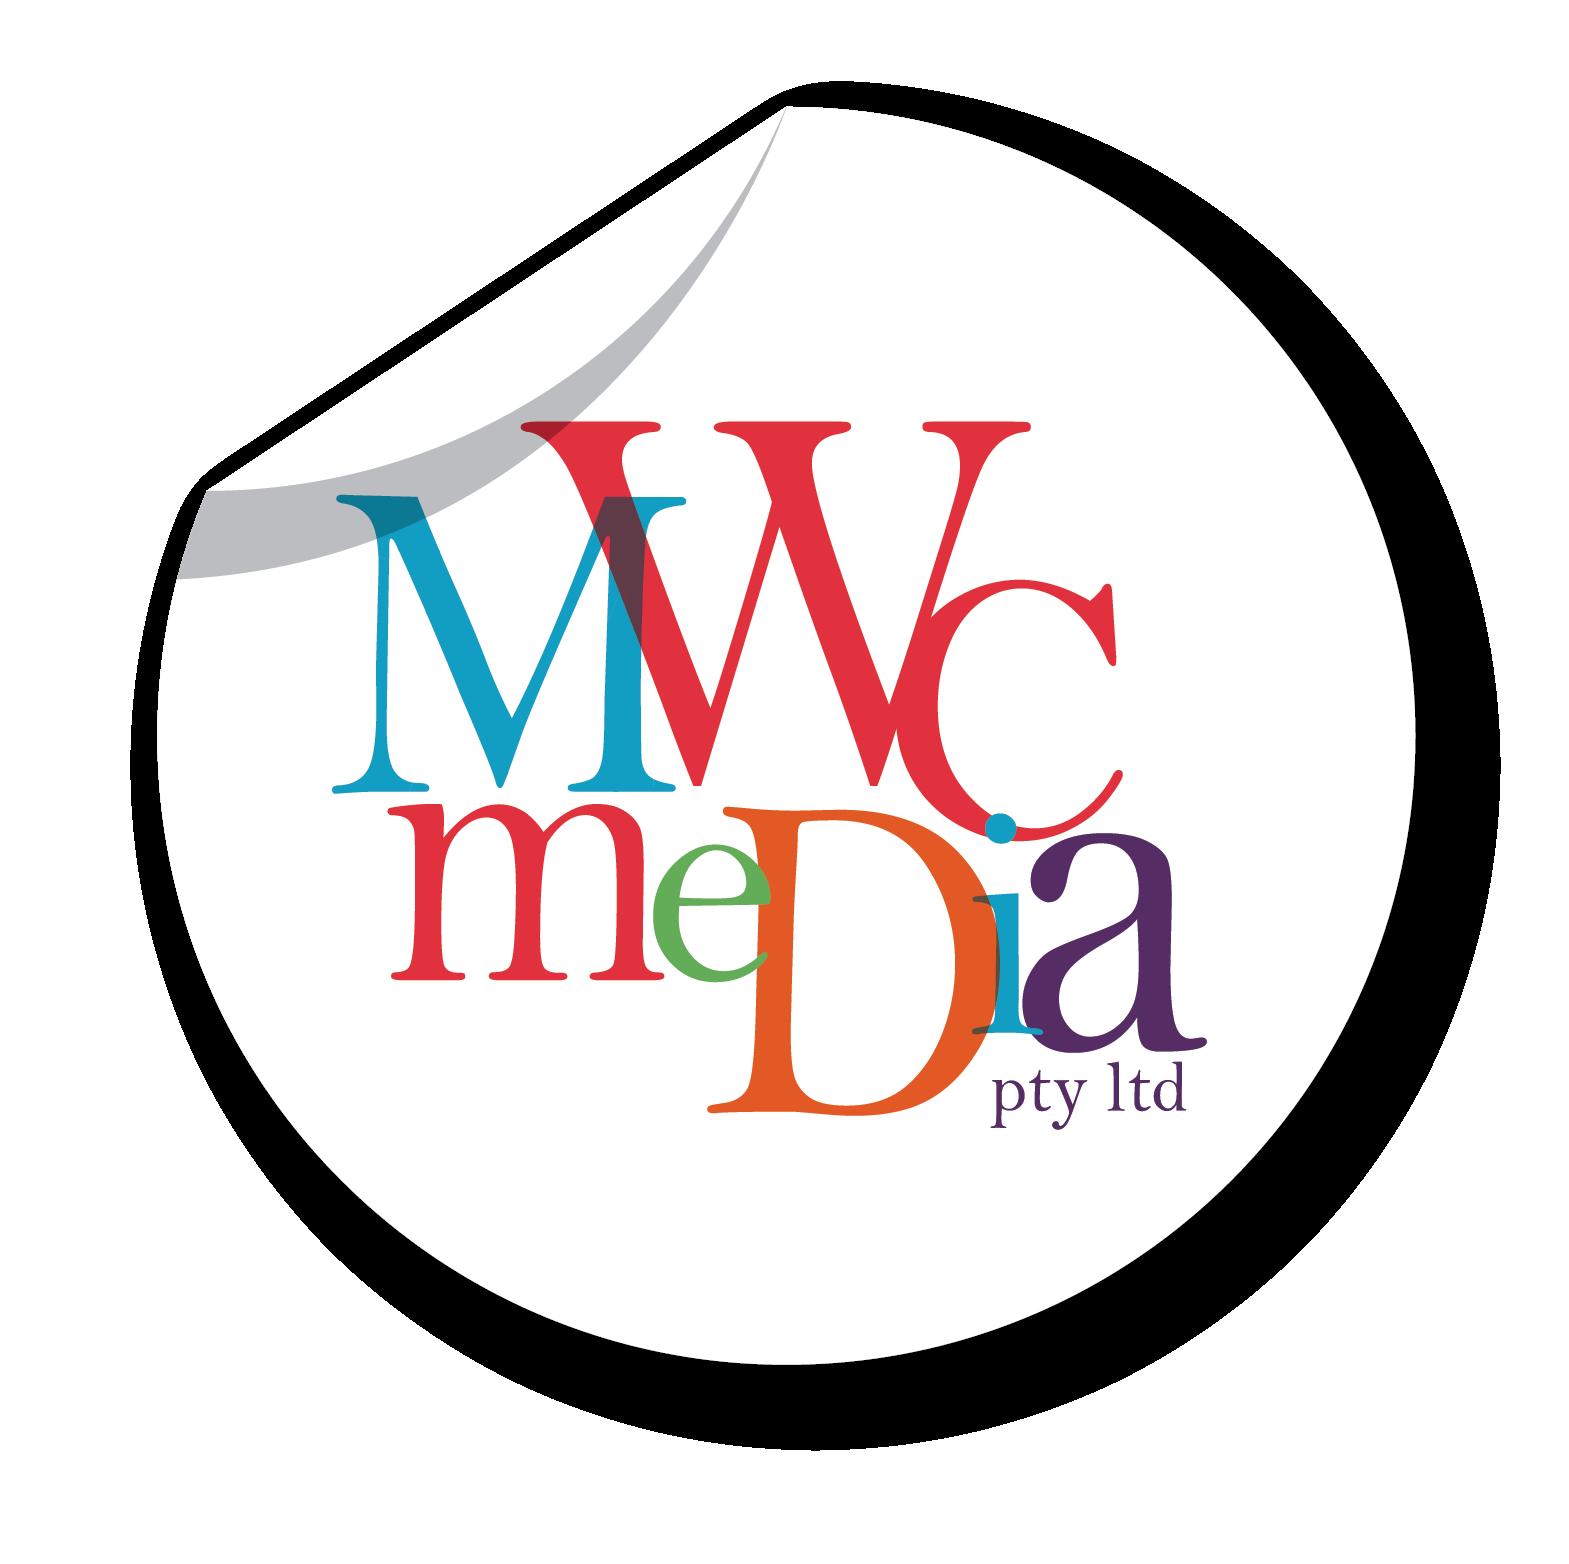 MWC Media